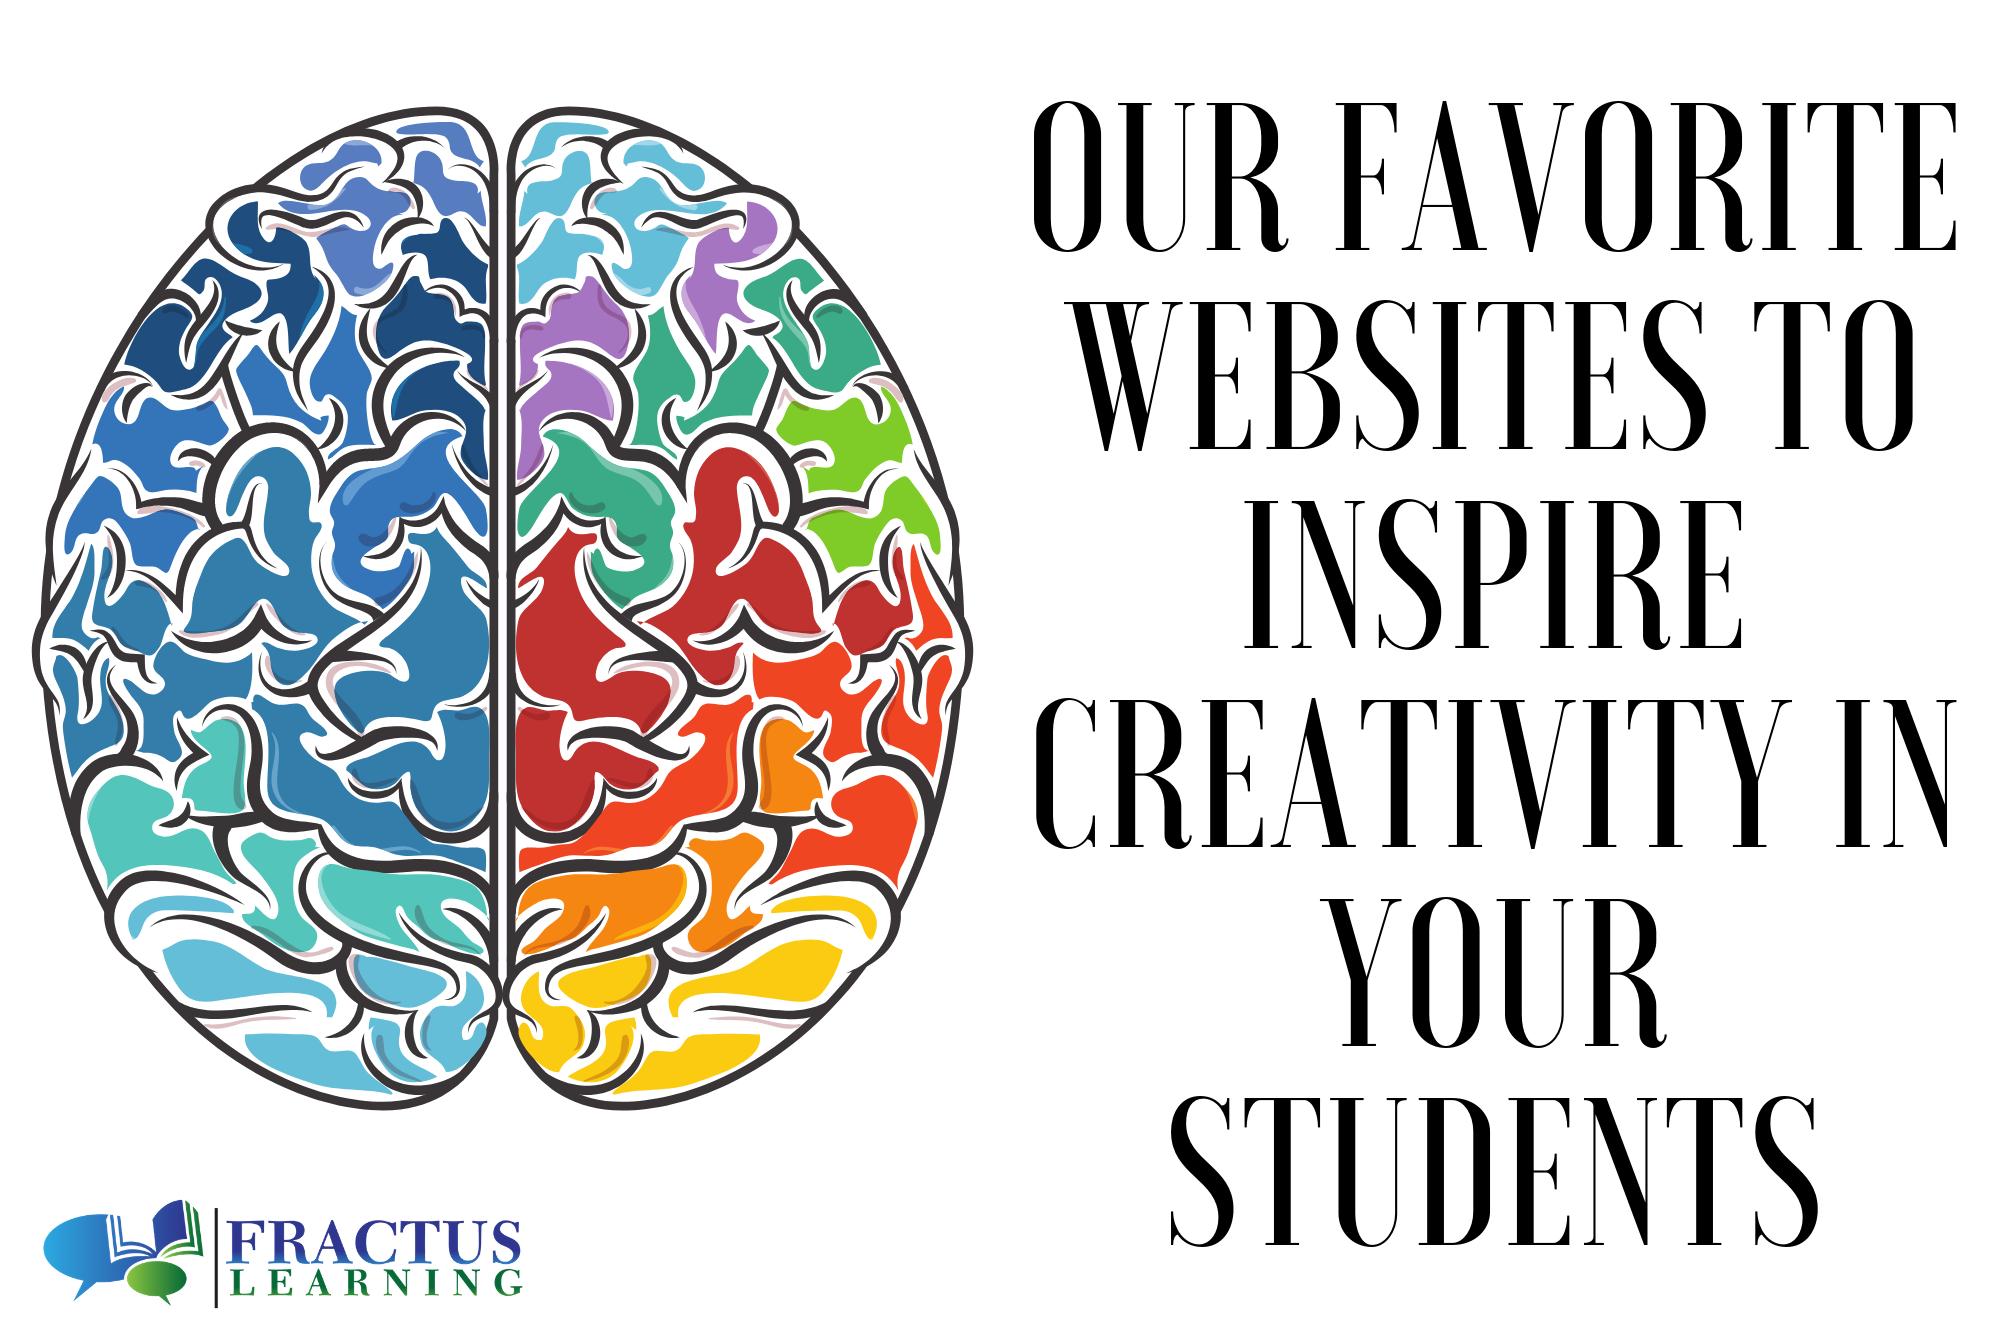 Websites to inspire creativity